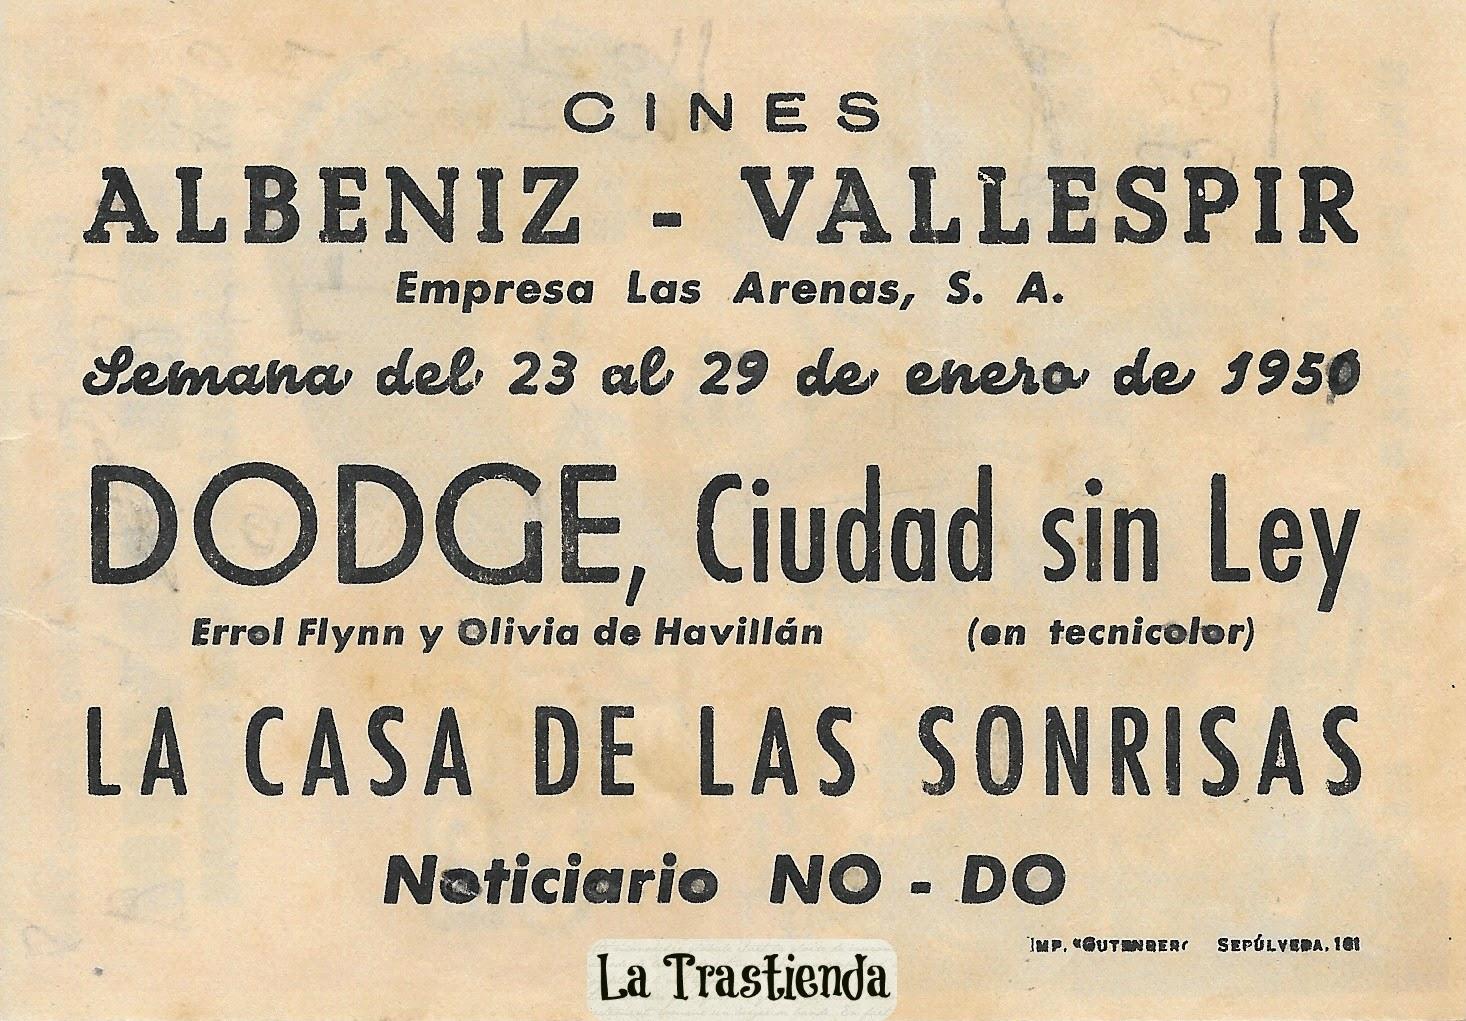 Programa de Cine - Dodge Ciudad Sin Ley - Errol Flynn - Olivia de Havilland - Ann Sheridan